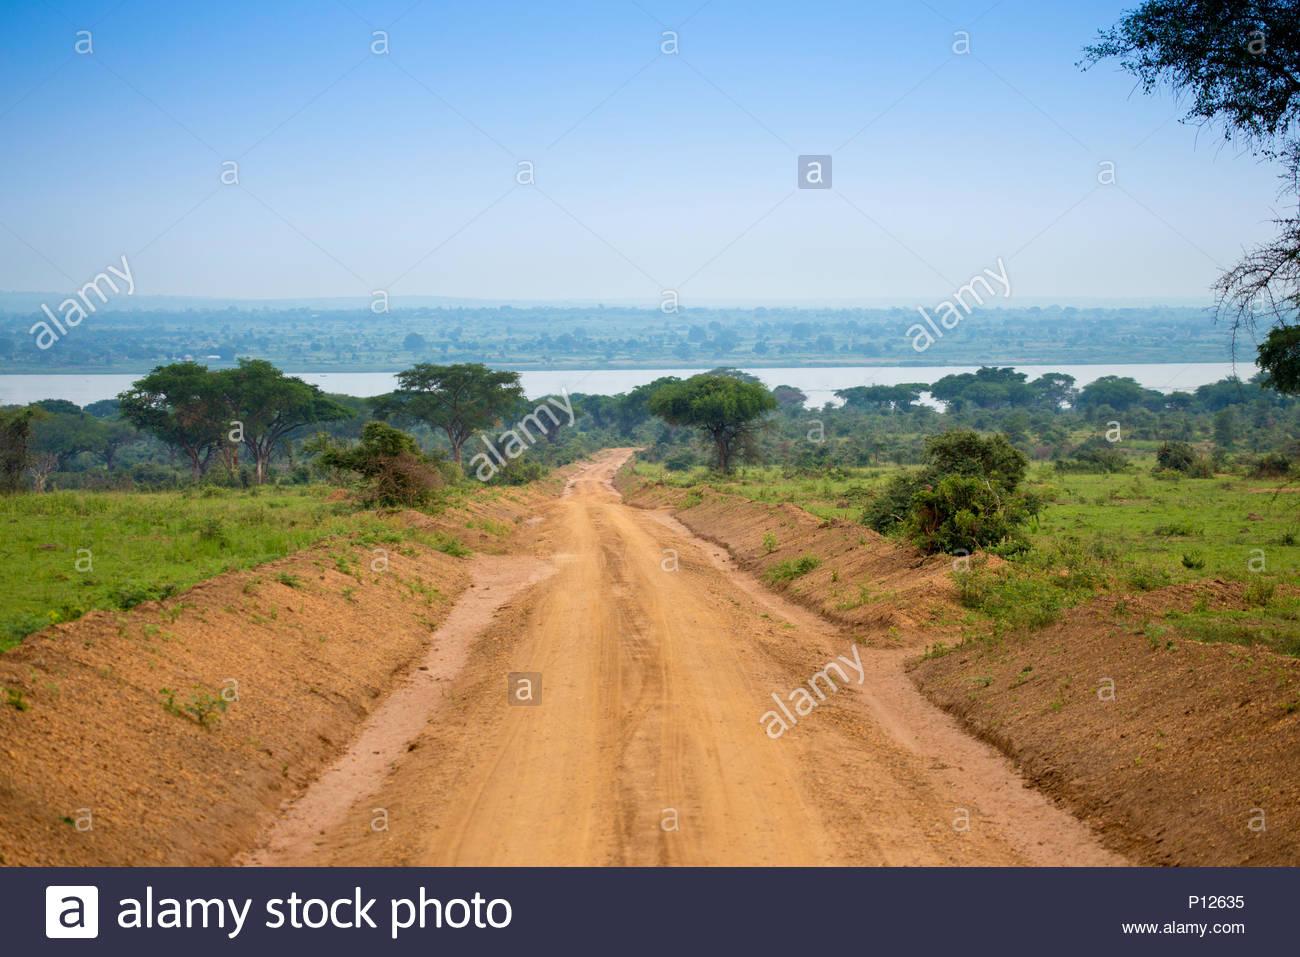 Murchison Falls National Park, Safari paesaggi, Uganda, Africa Immagini Stock